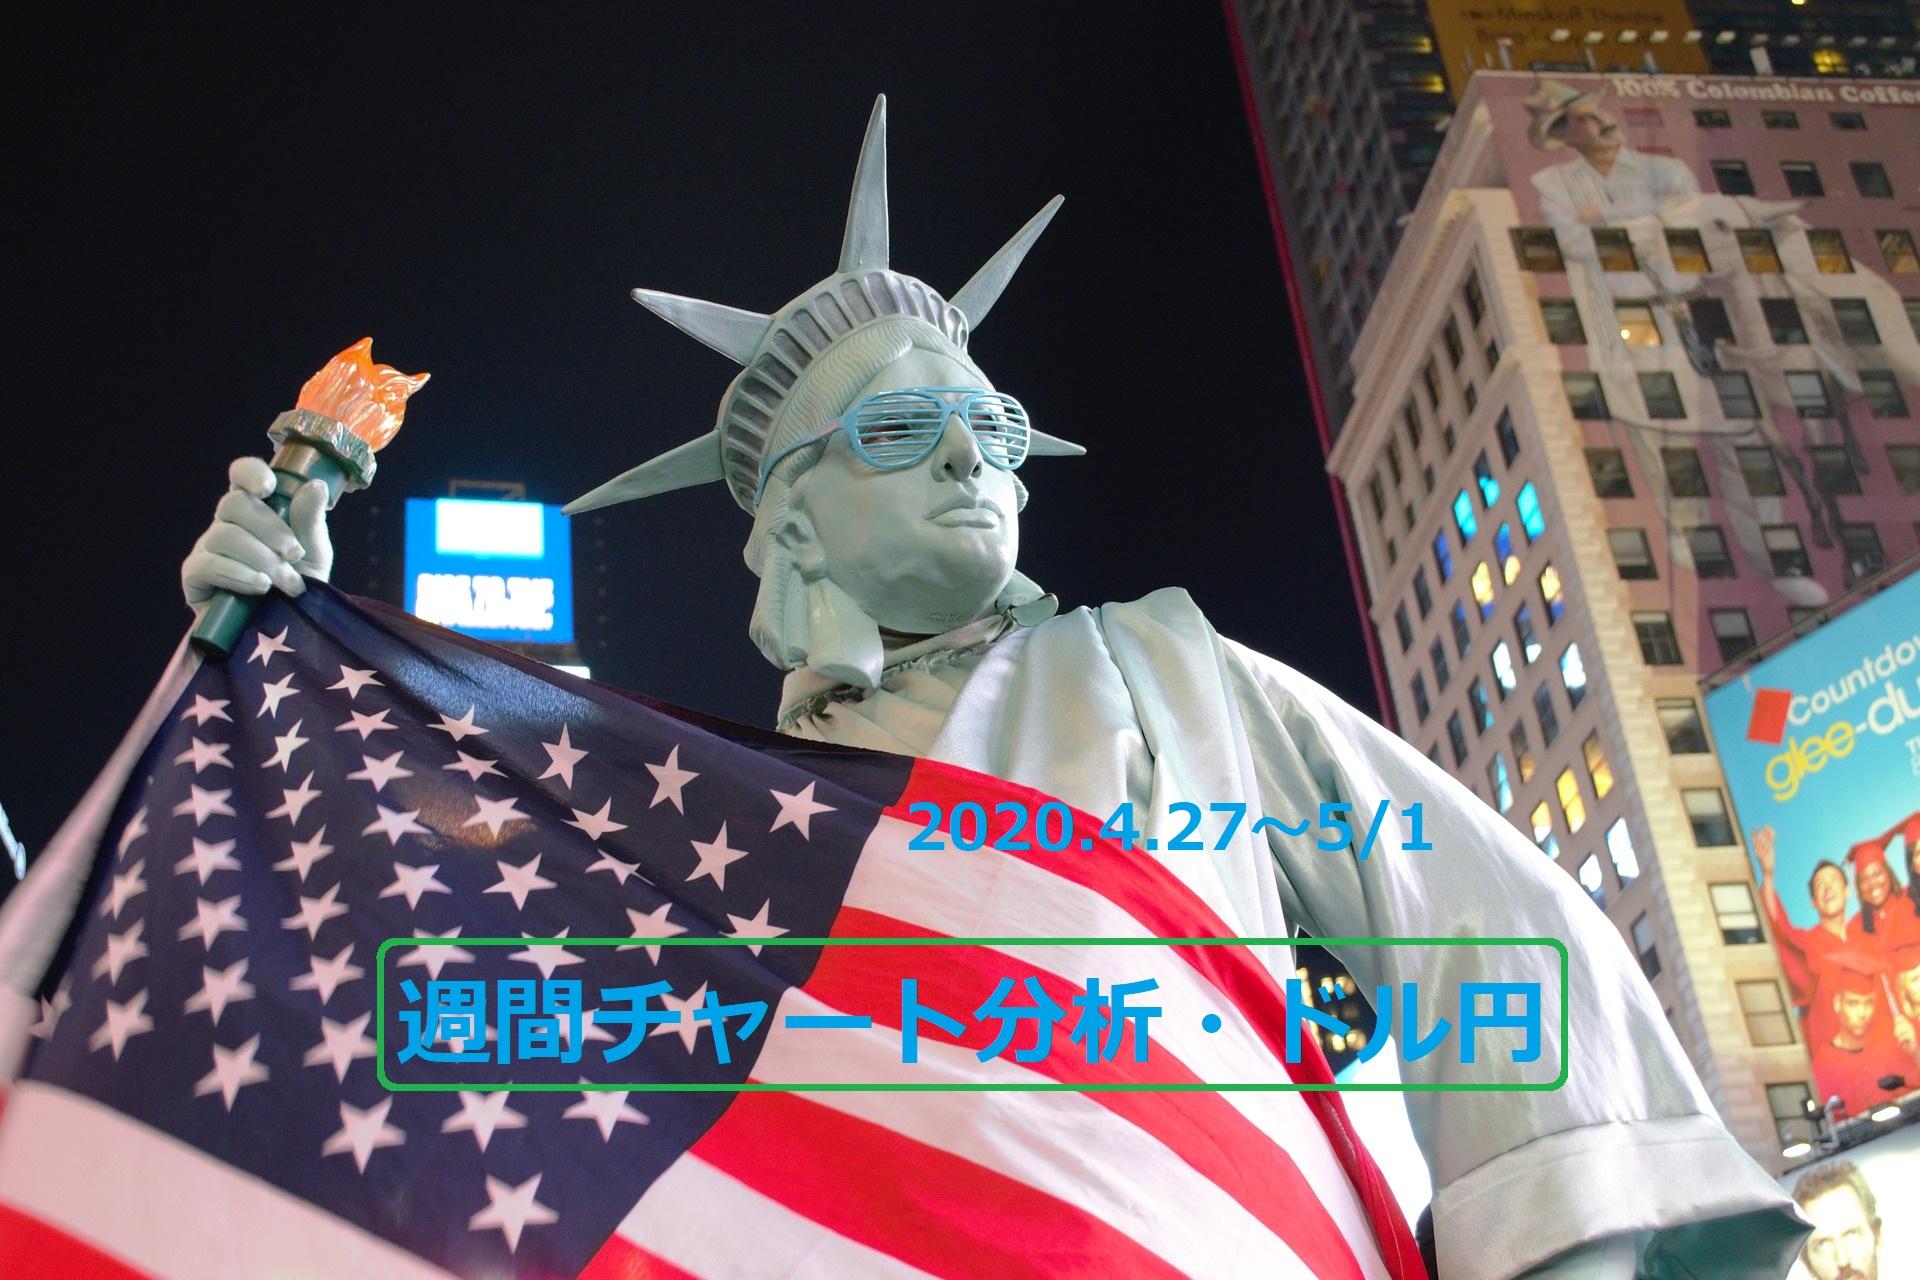 【FX】週間チャート分析・ドル円【2020.4/27~5/1】